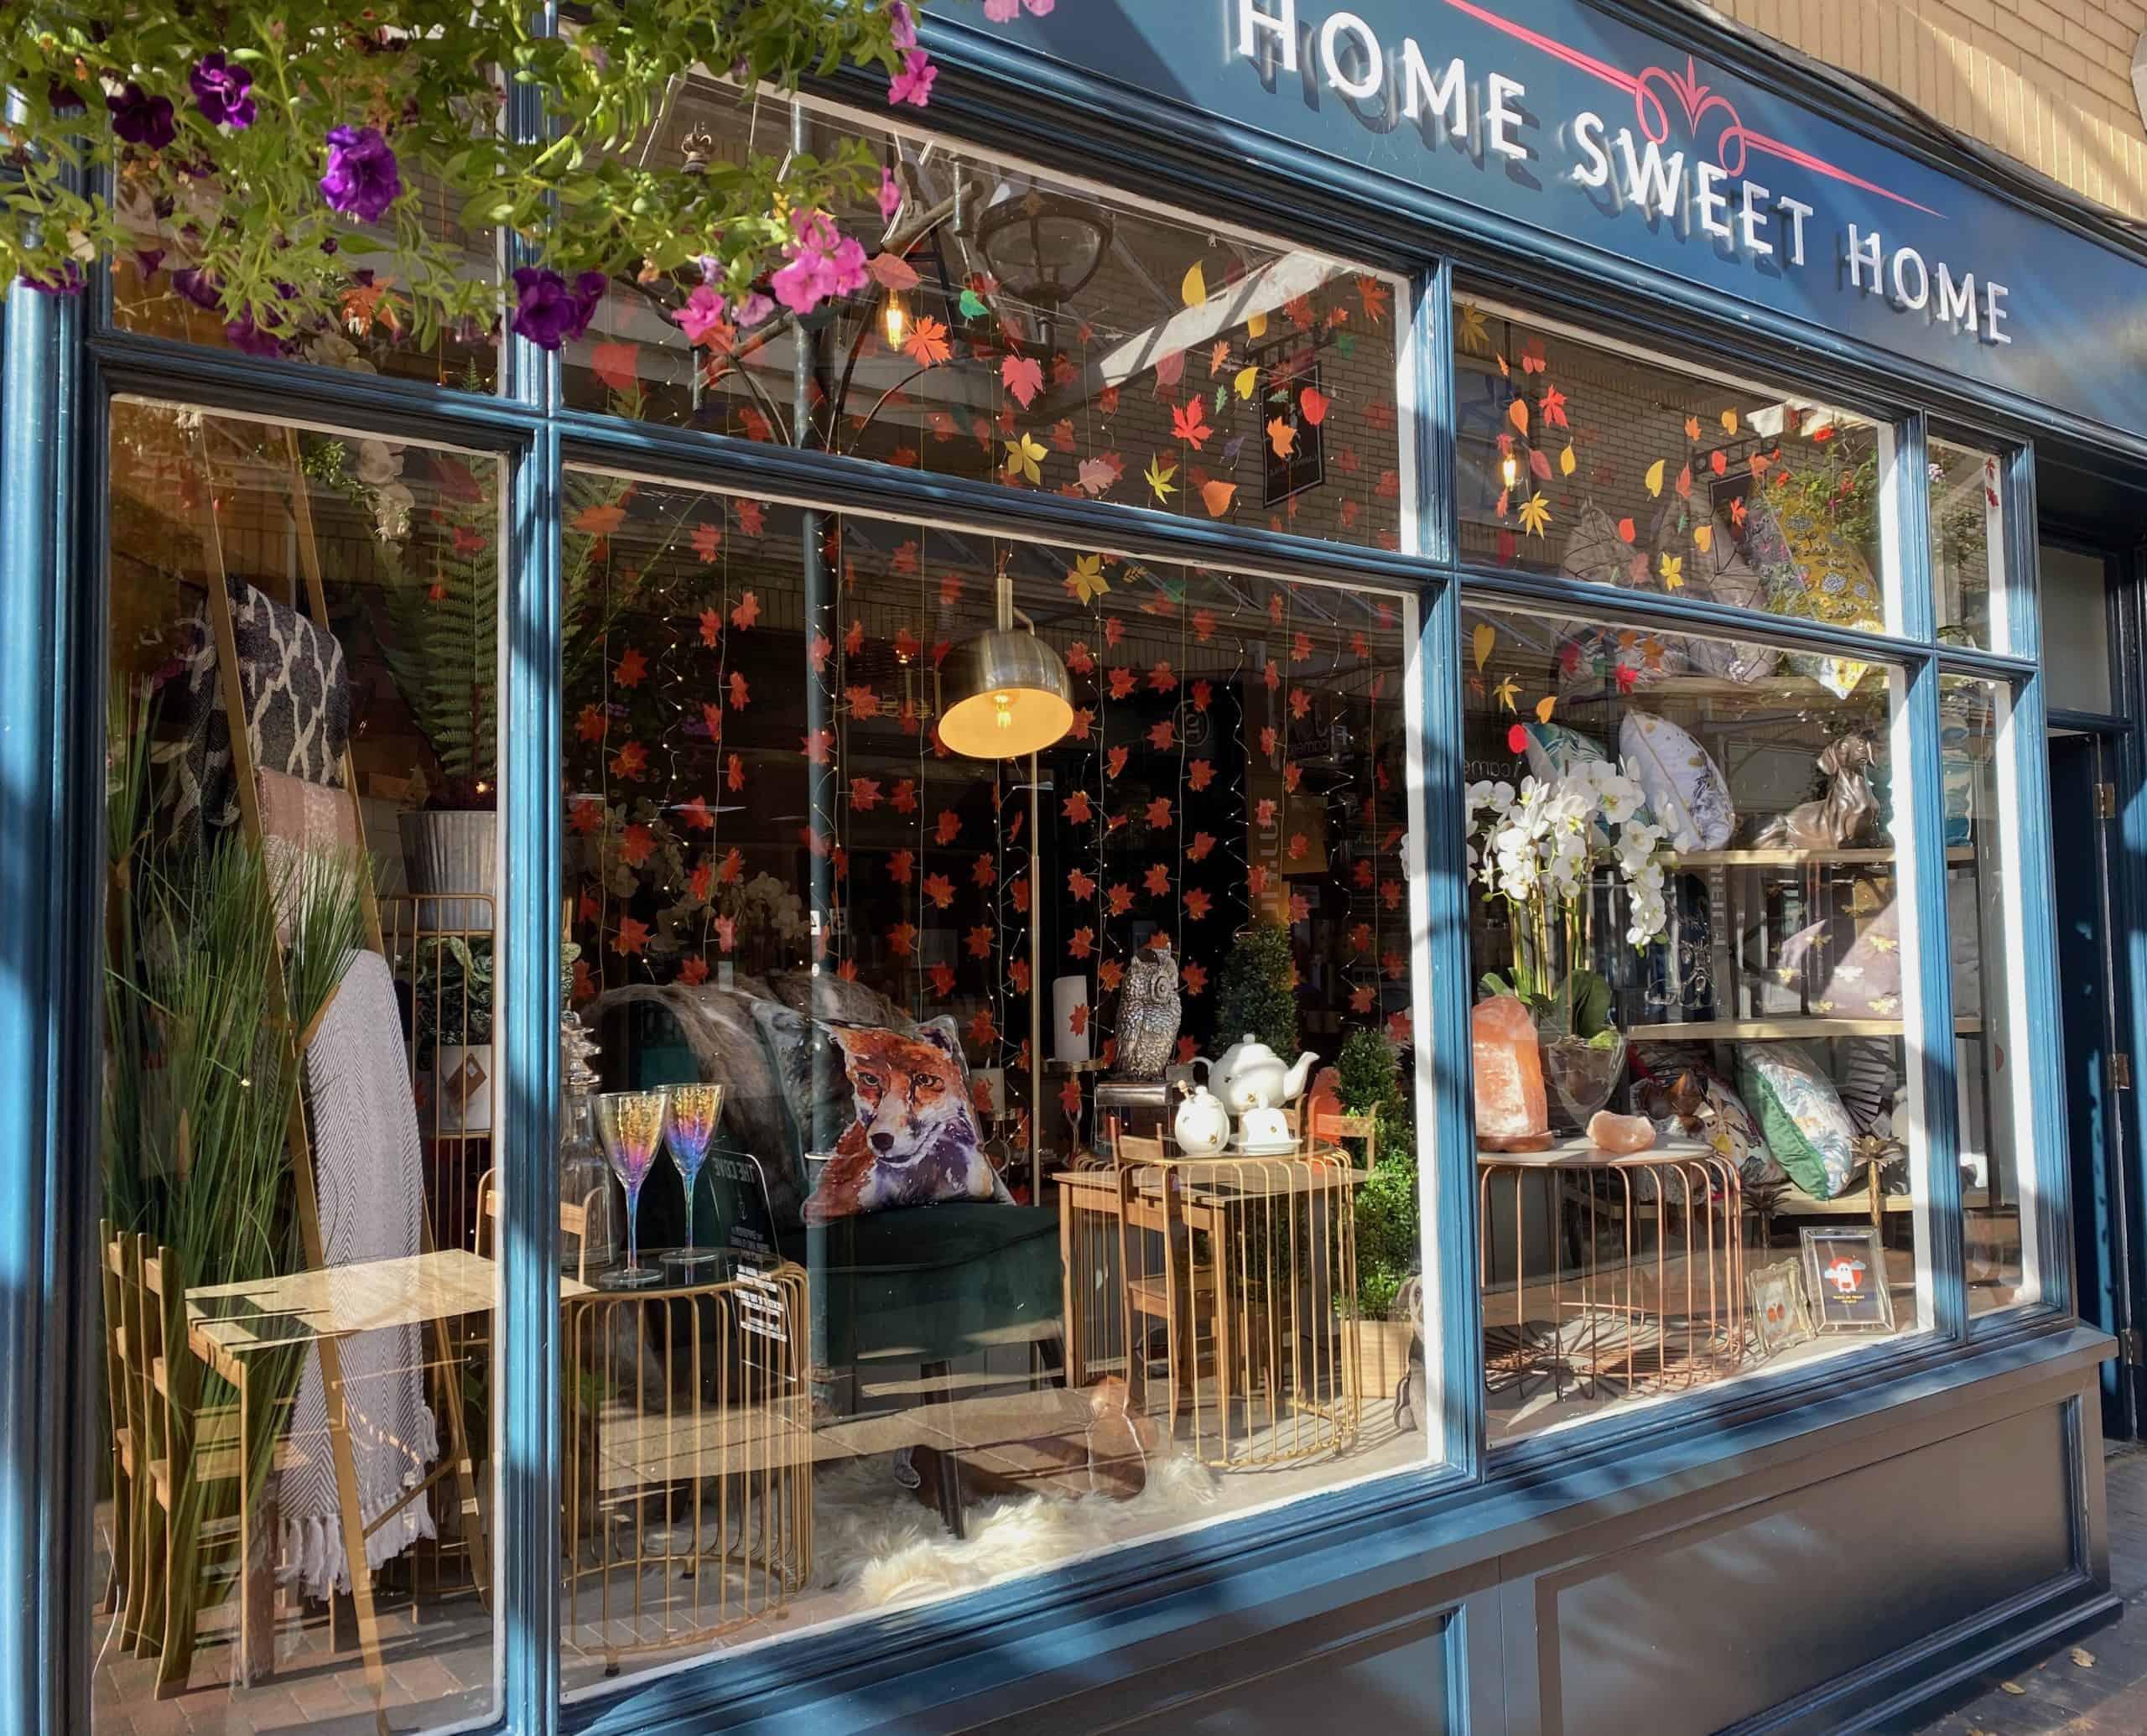 Home Sweet Home Homewares shop